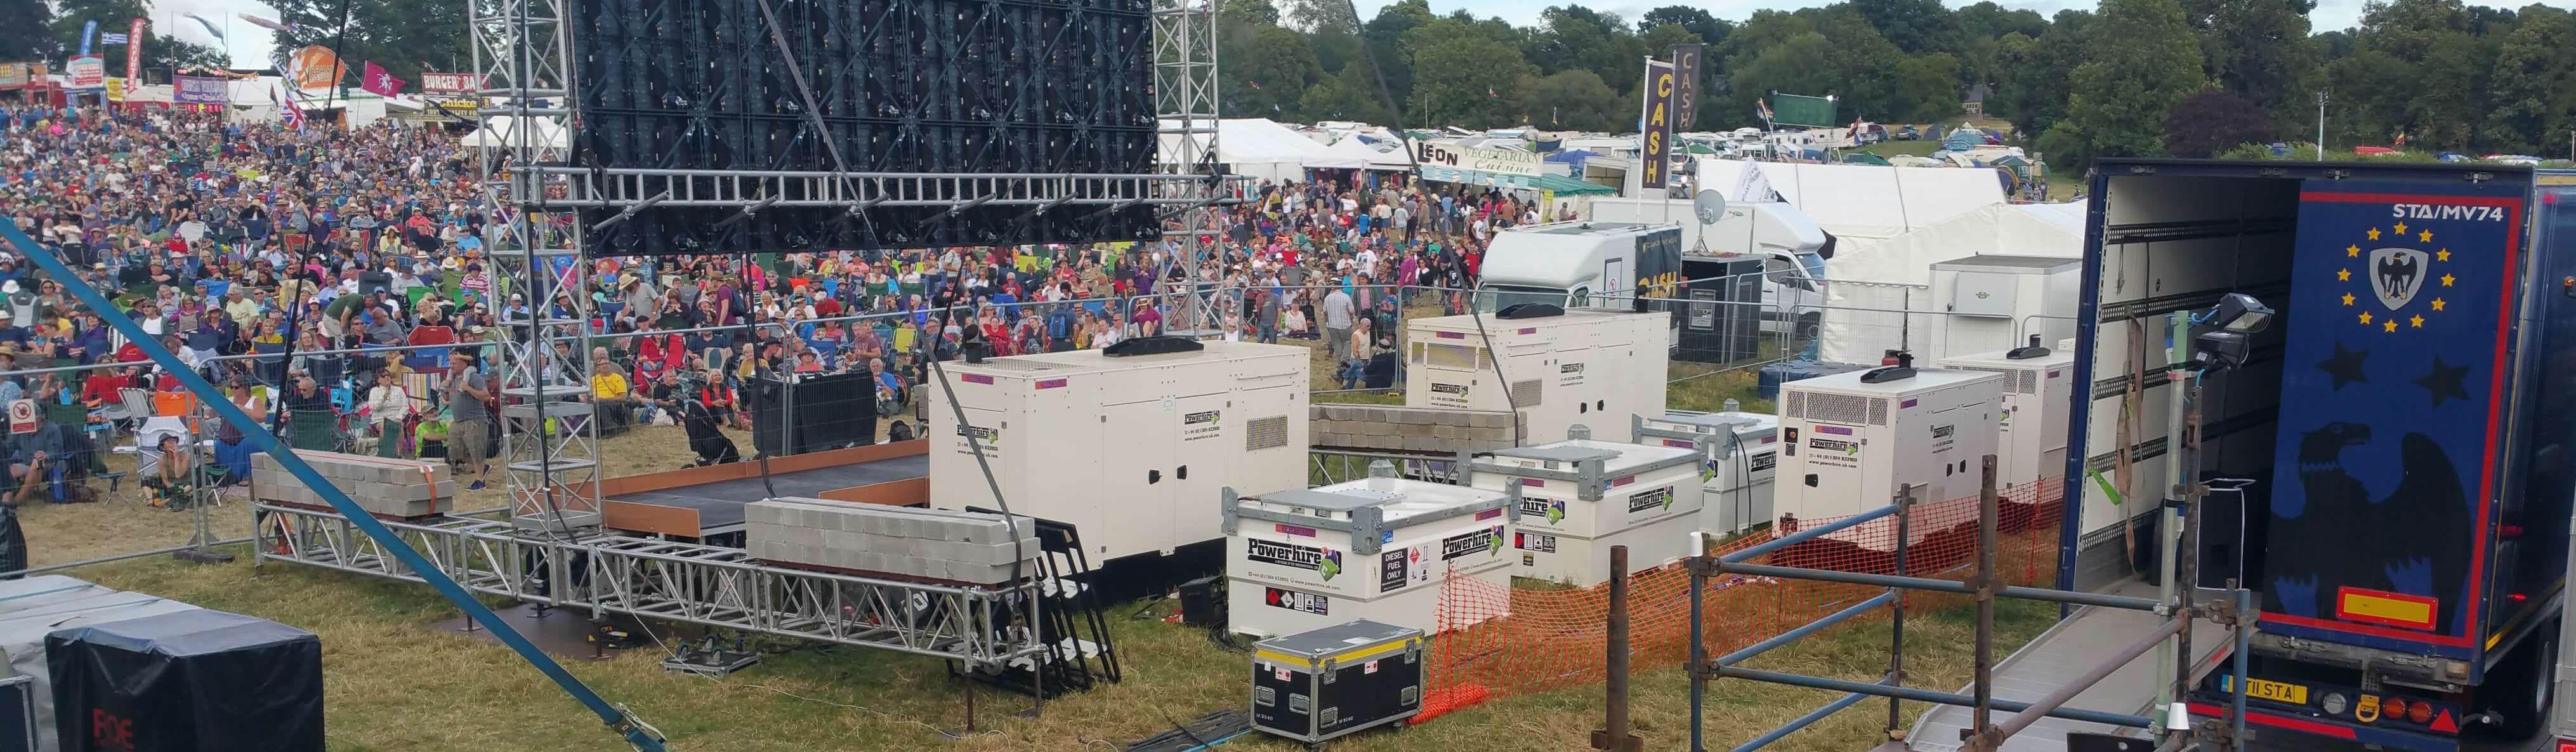 Festival-generator-power-1